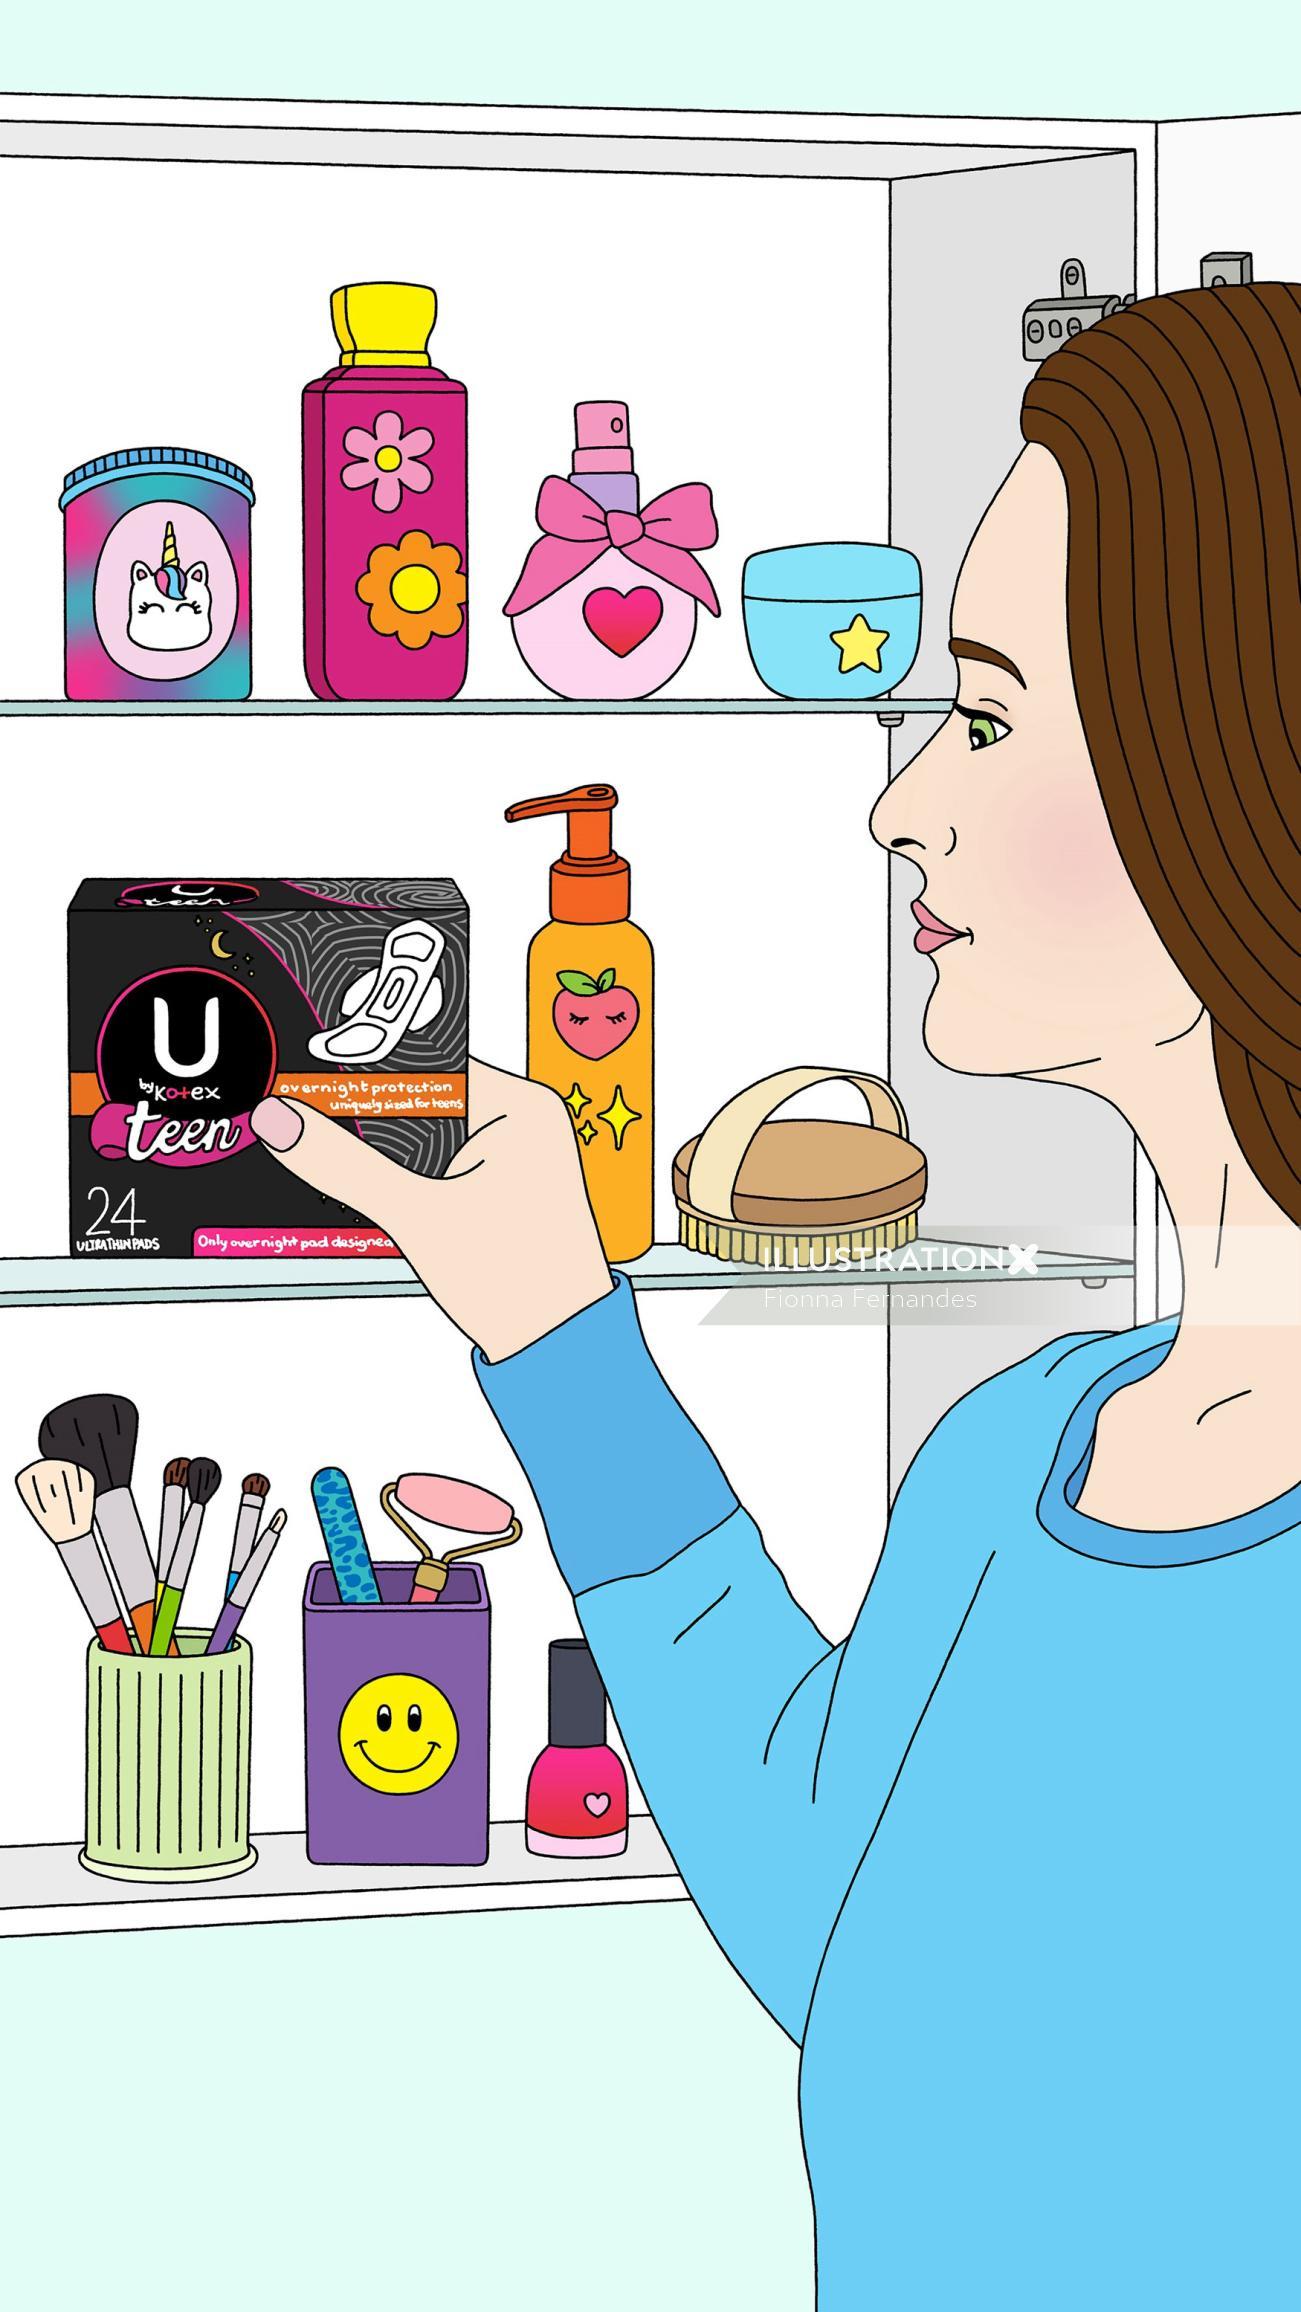 Lifestyle U by Kotex Teen Pads